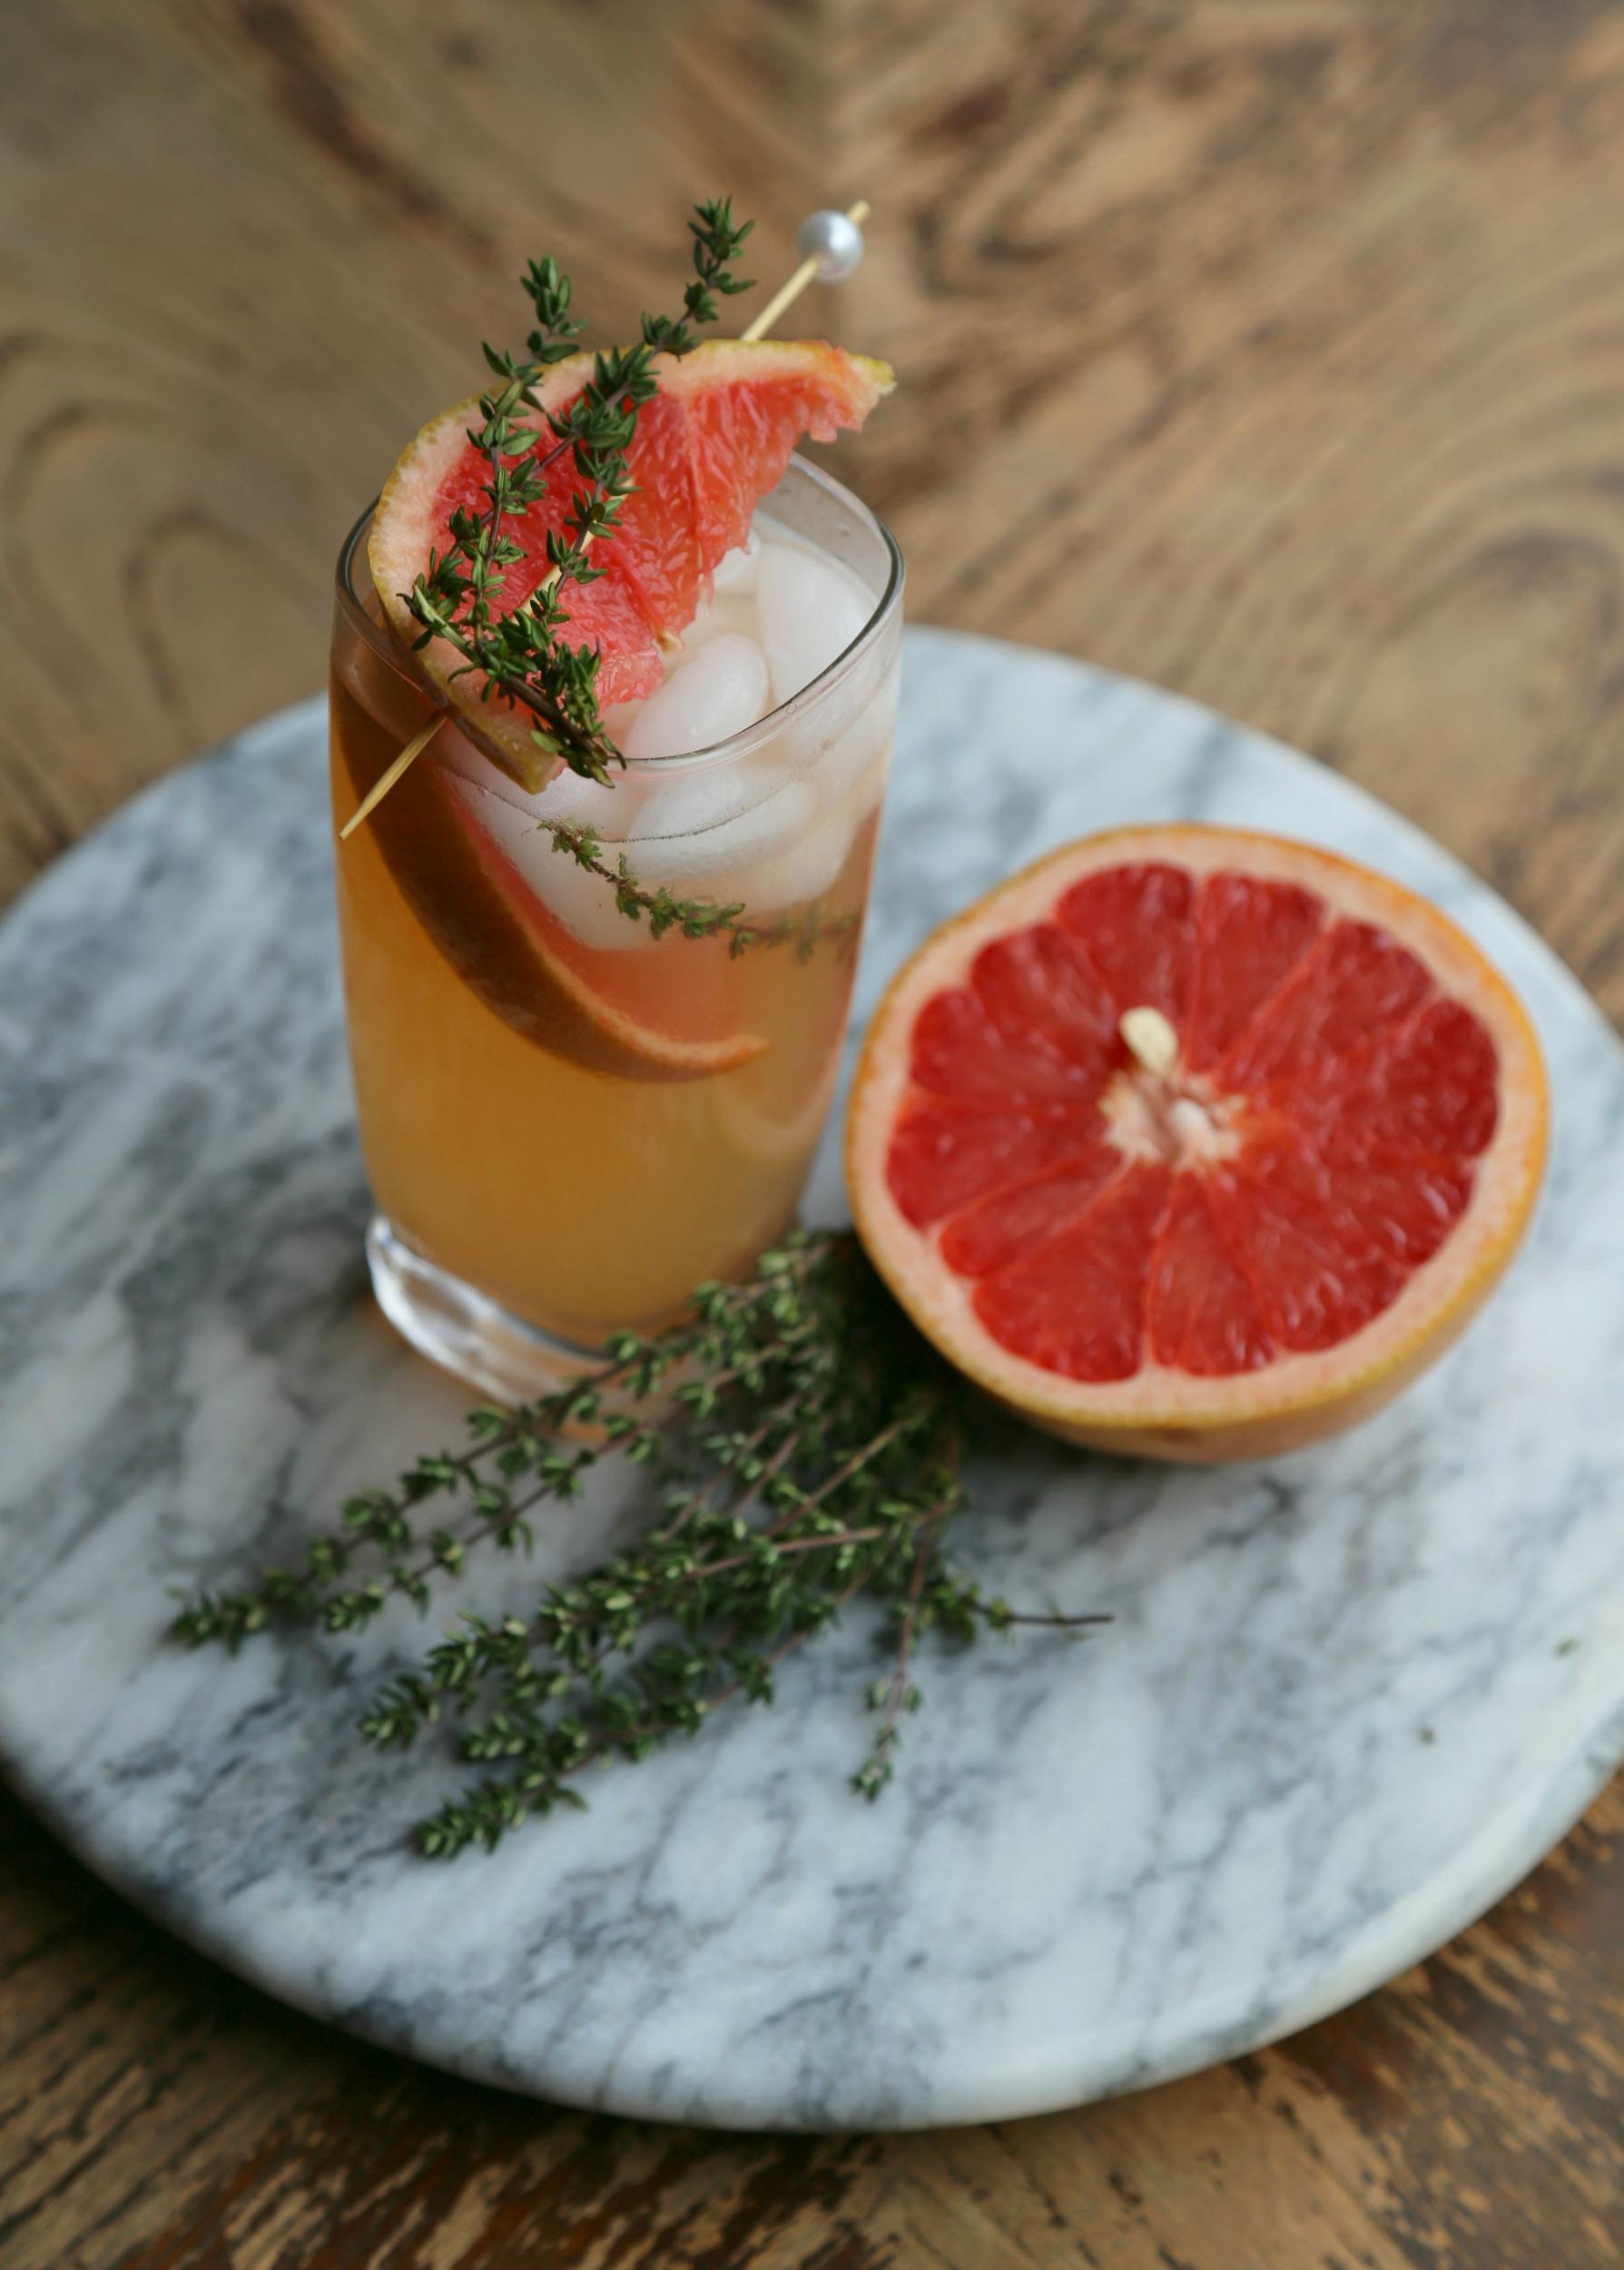 thyme-grapefruit-mocktail-infused-simple-syrup-vianneyrodriguez-sweetlifebake